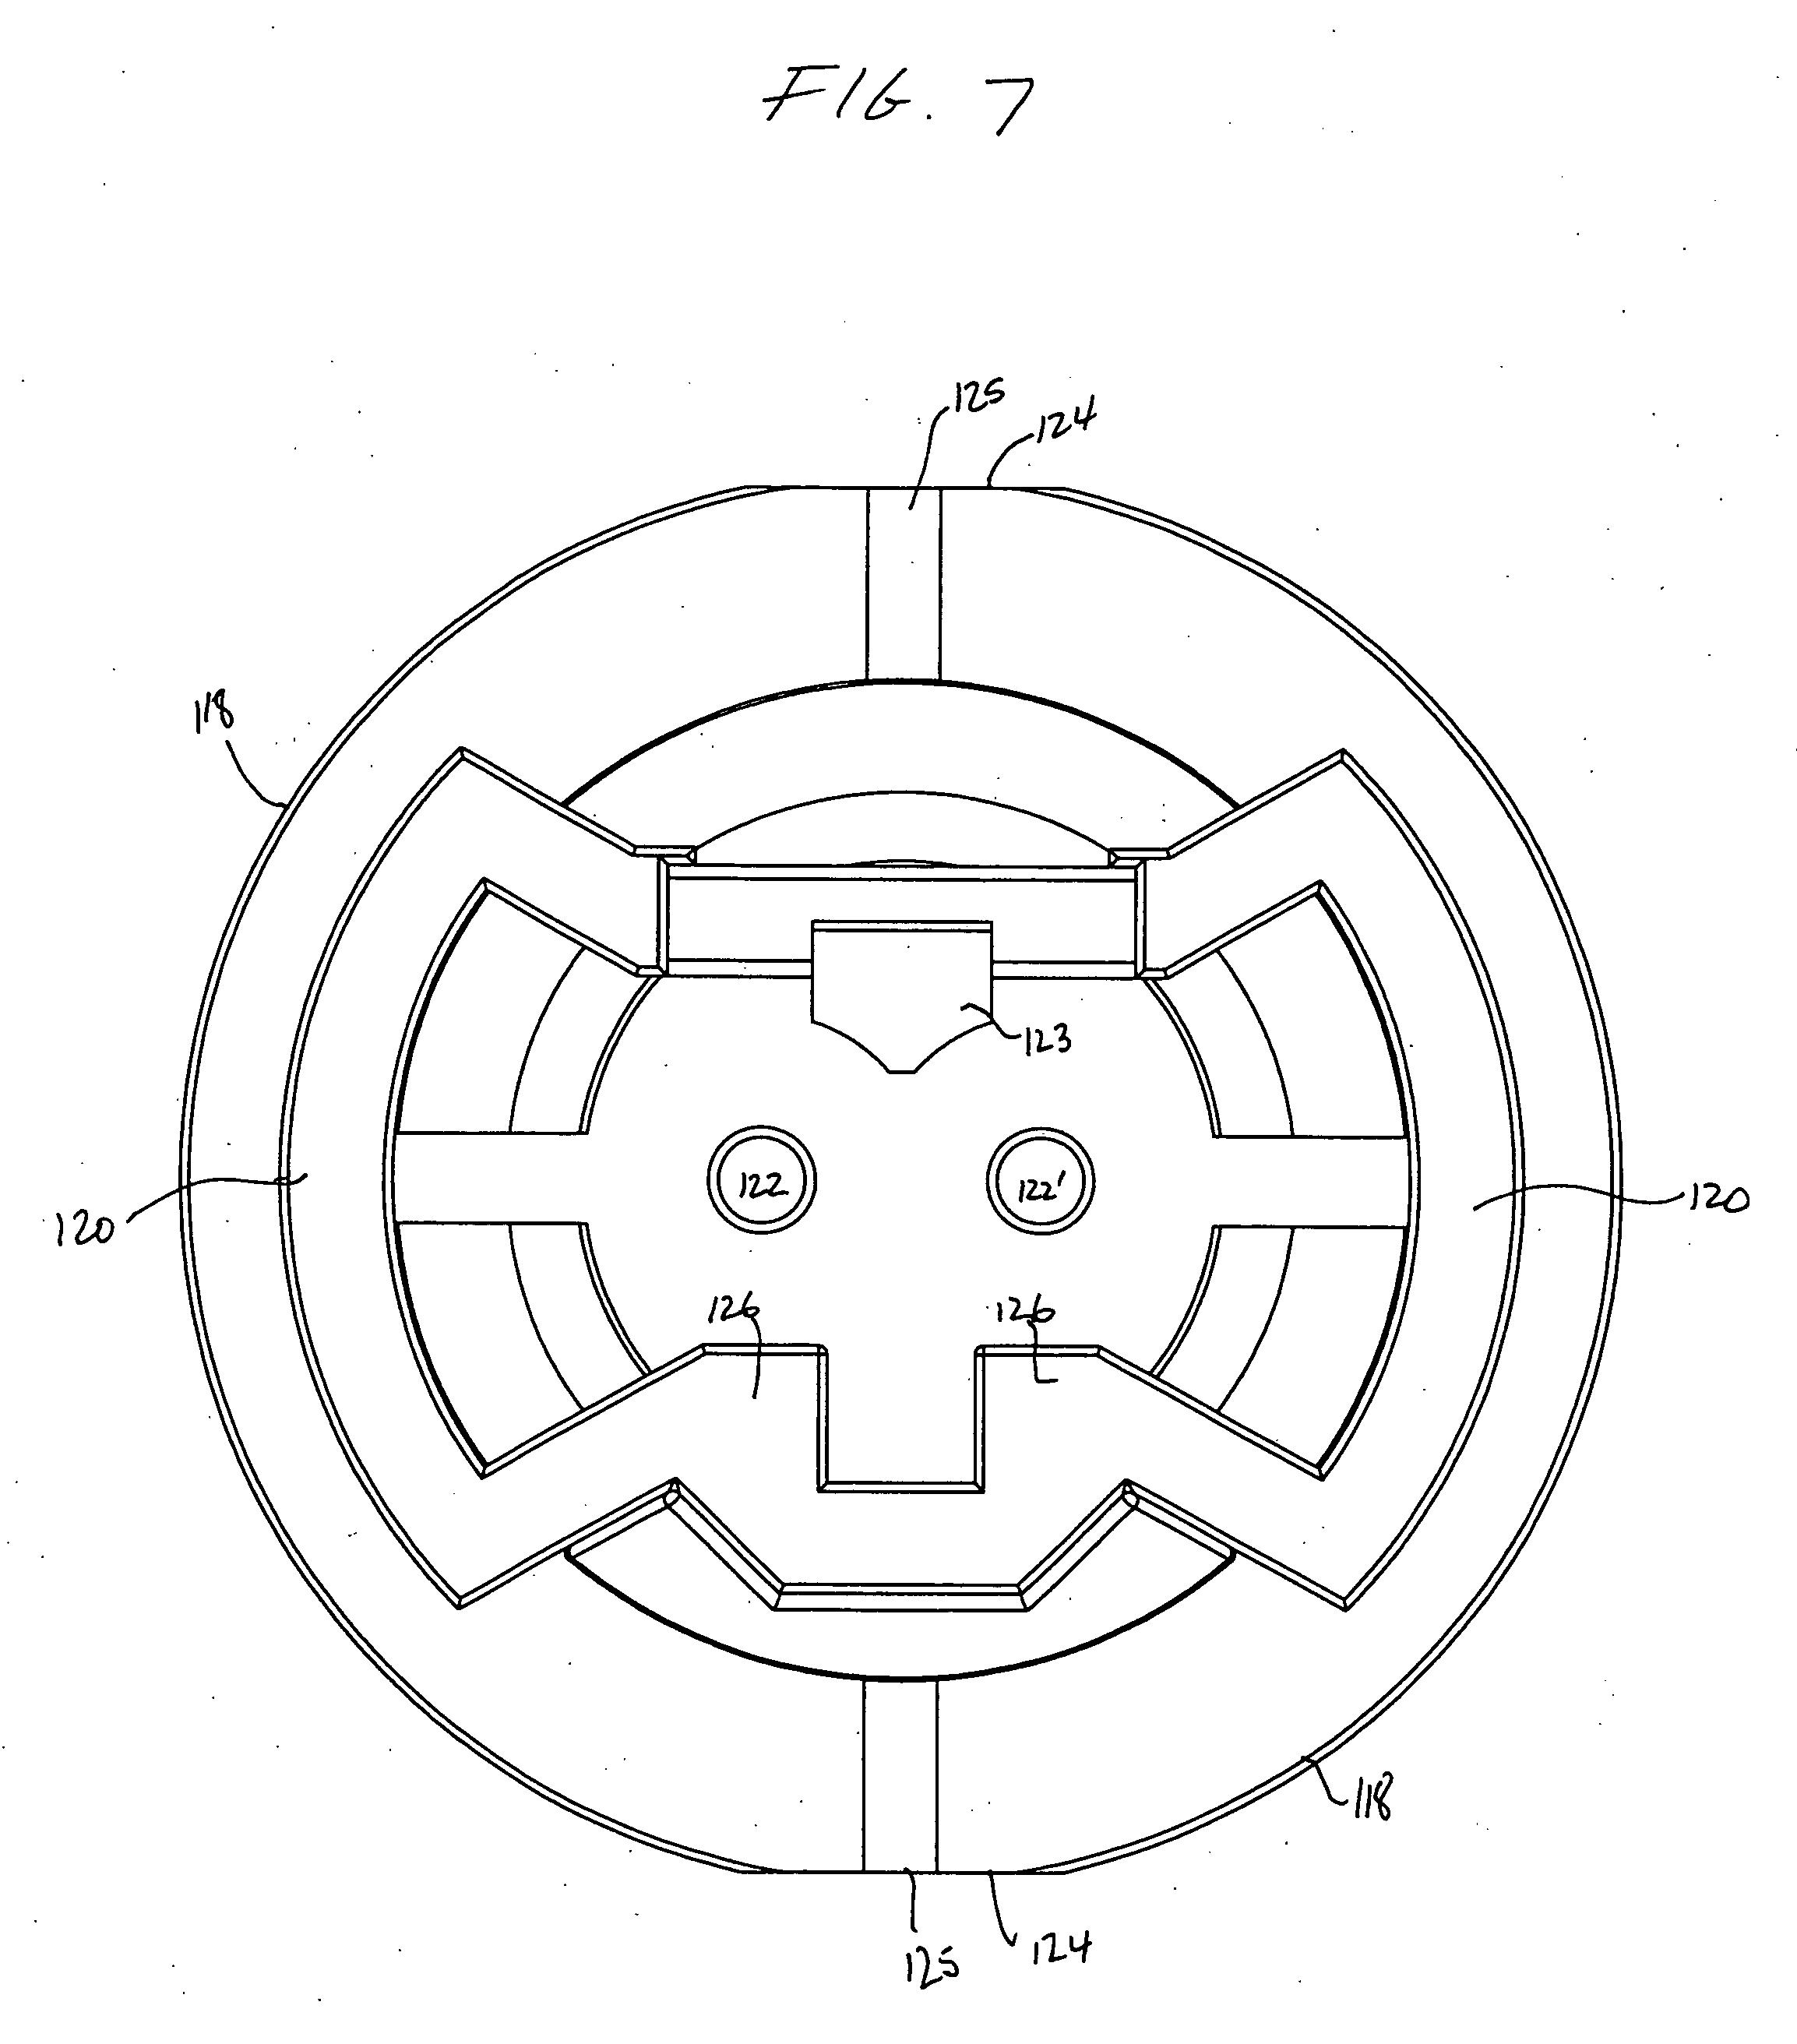 cessna 172 wiring diagram cessna wiring diagram collections cessna 150 wing diagram